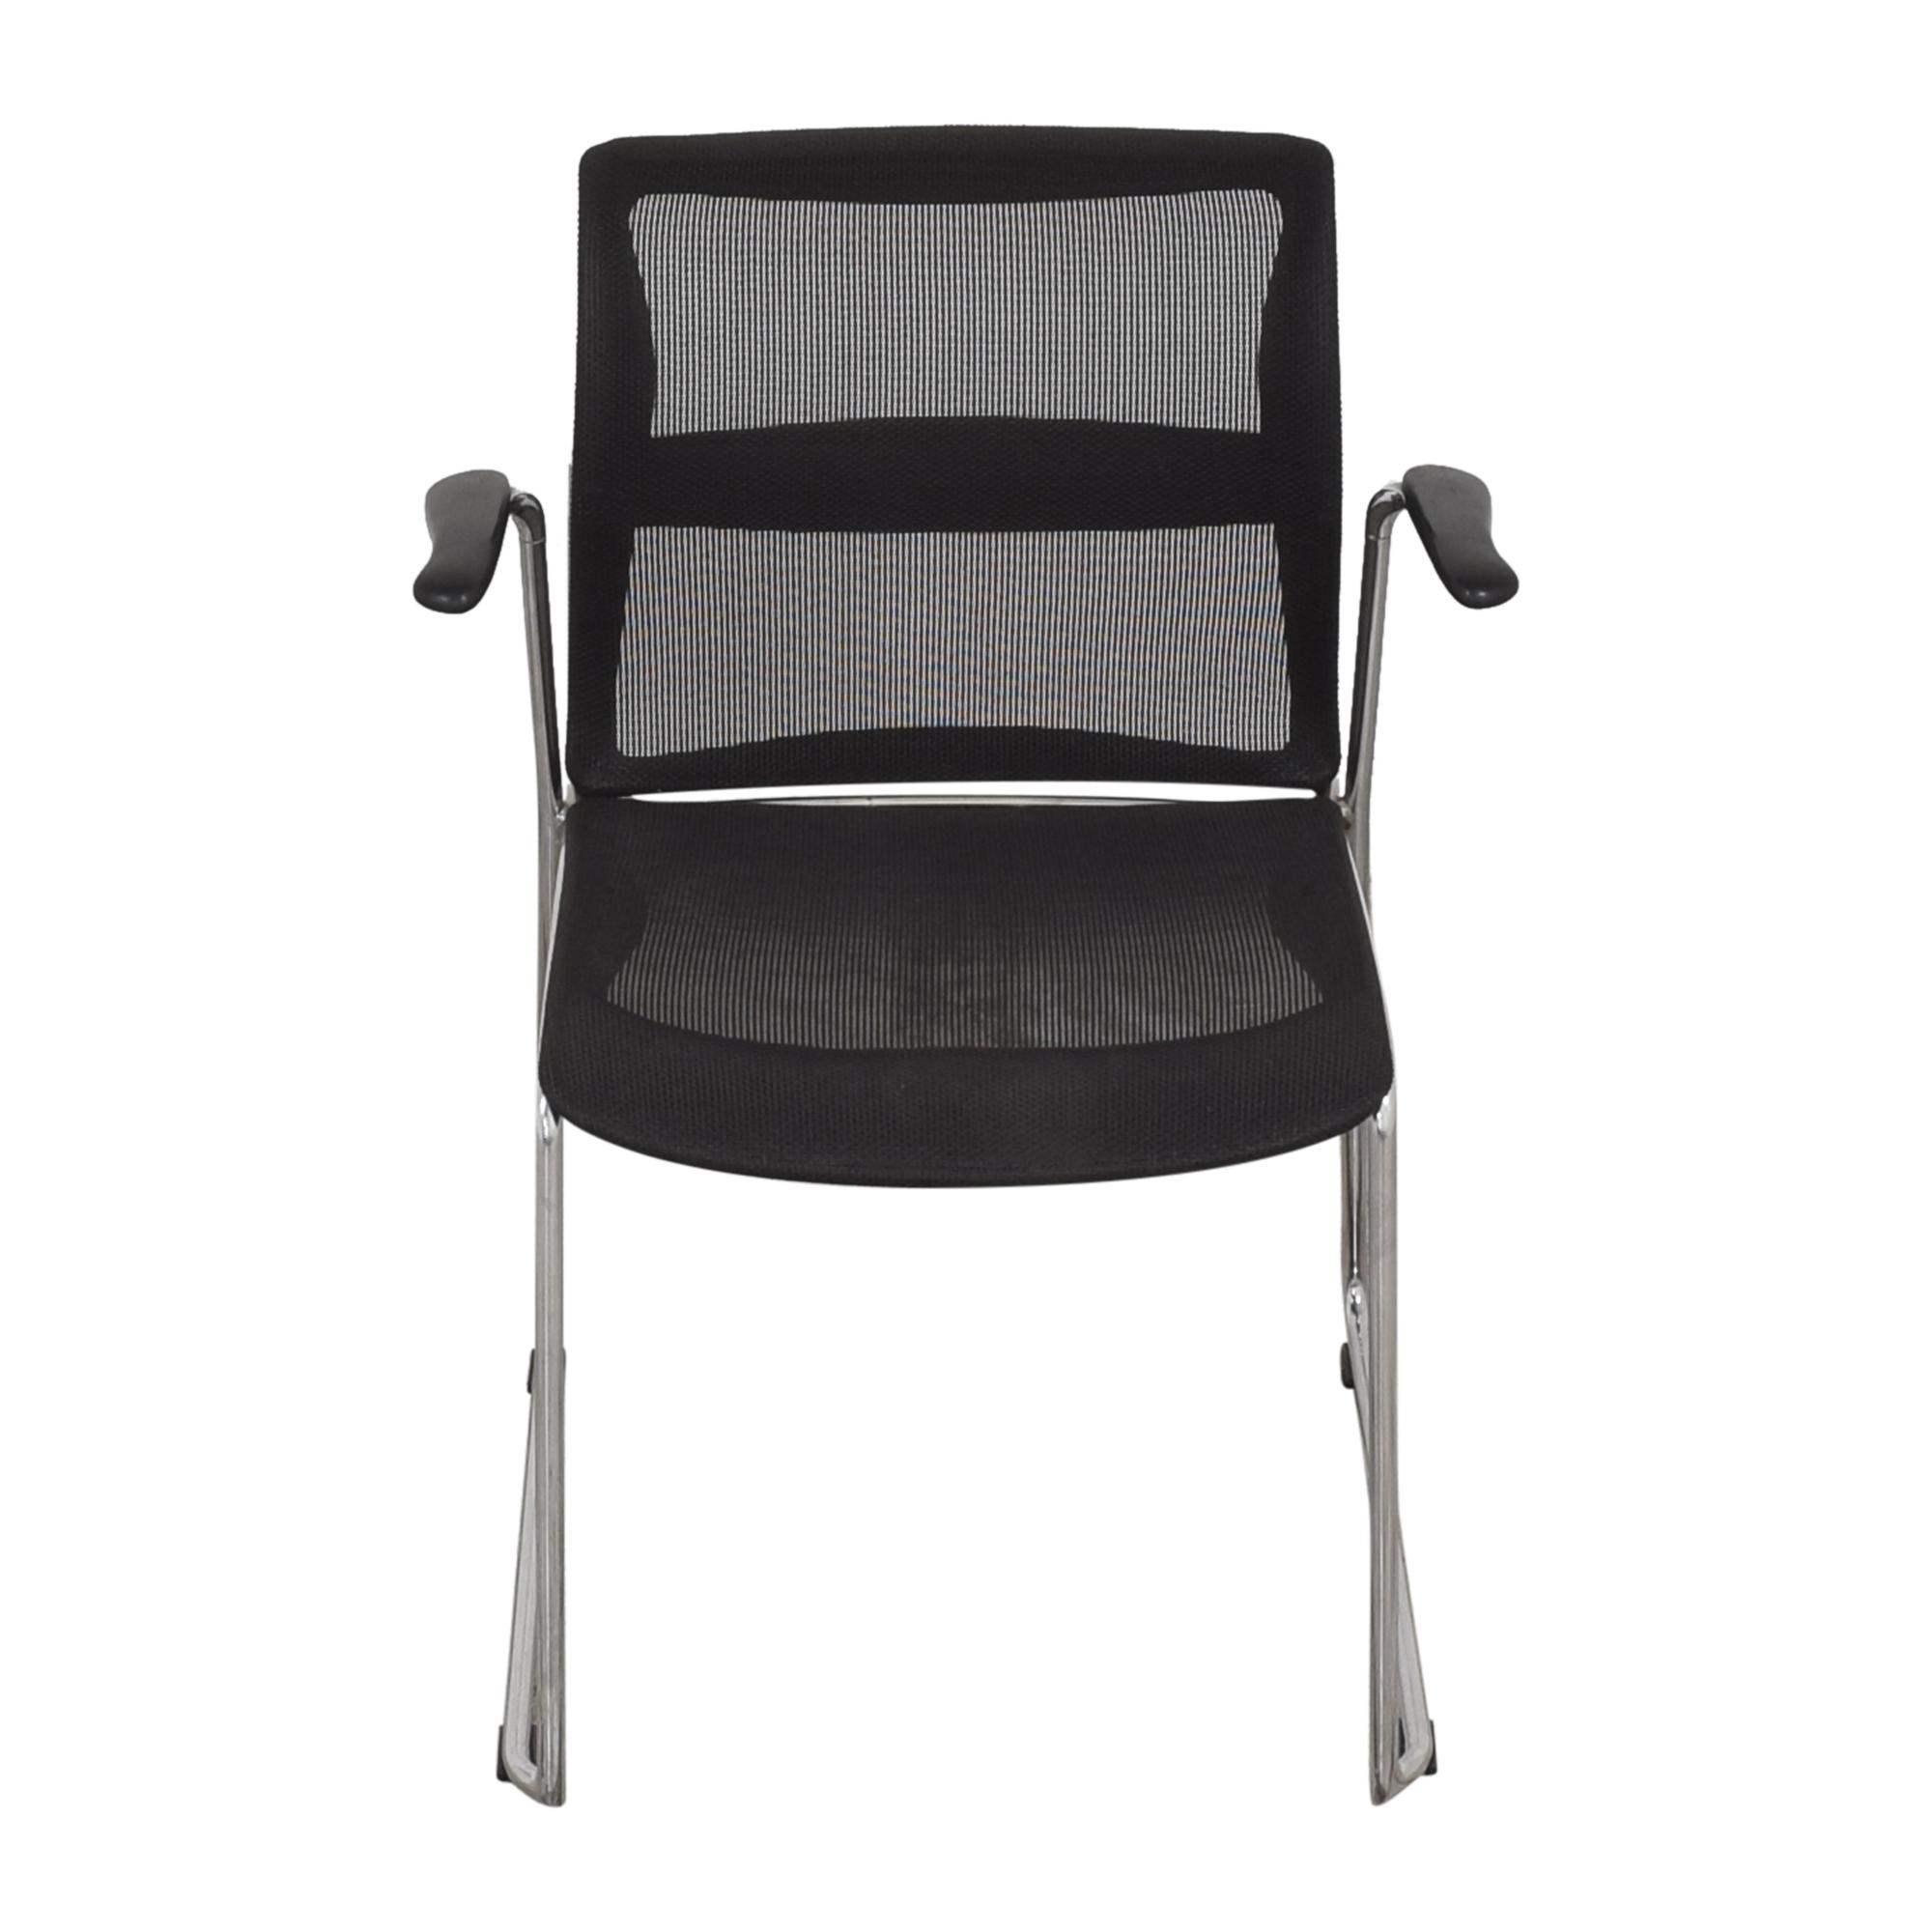 buy Stylex Zephyr Stacking Arm Chair Stylex